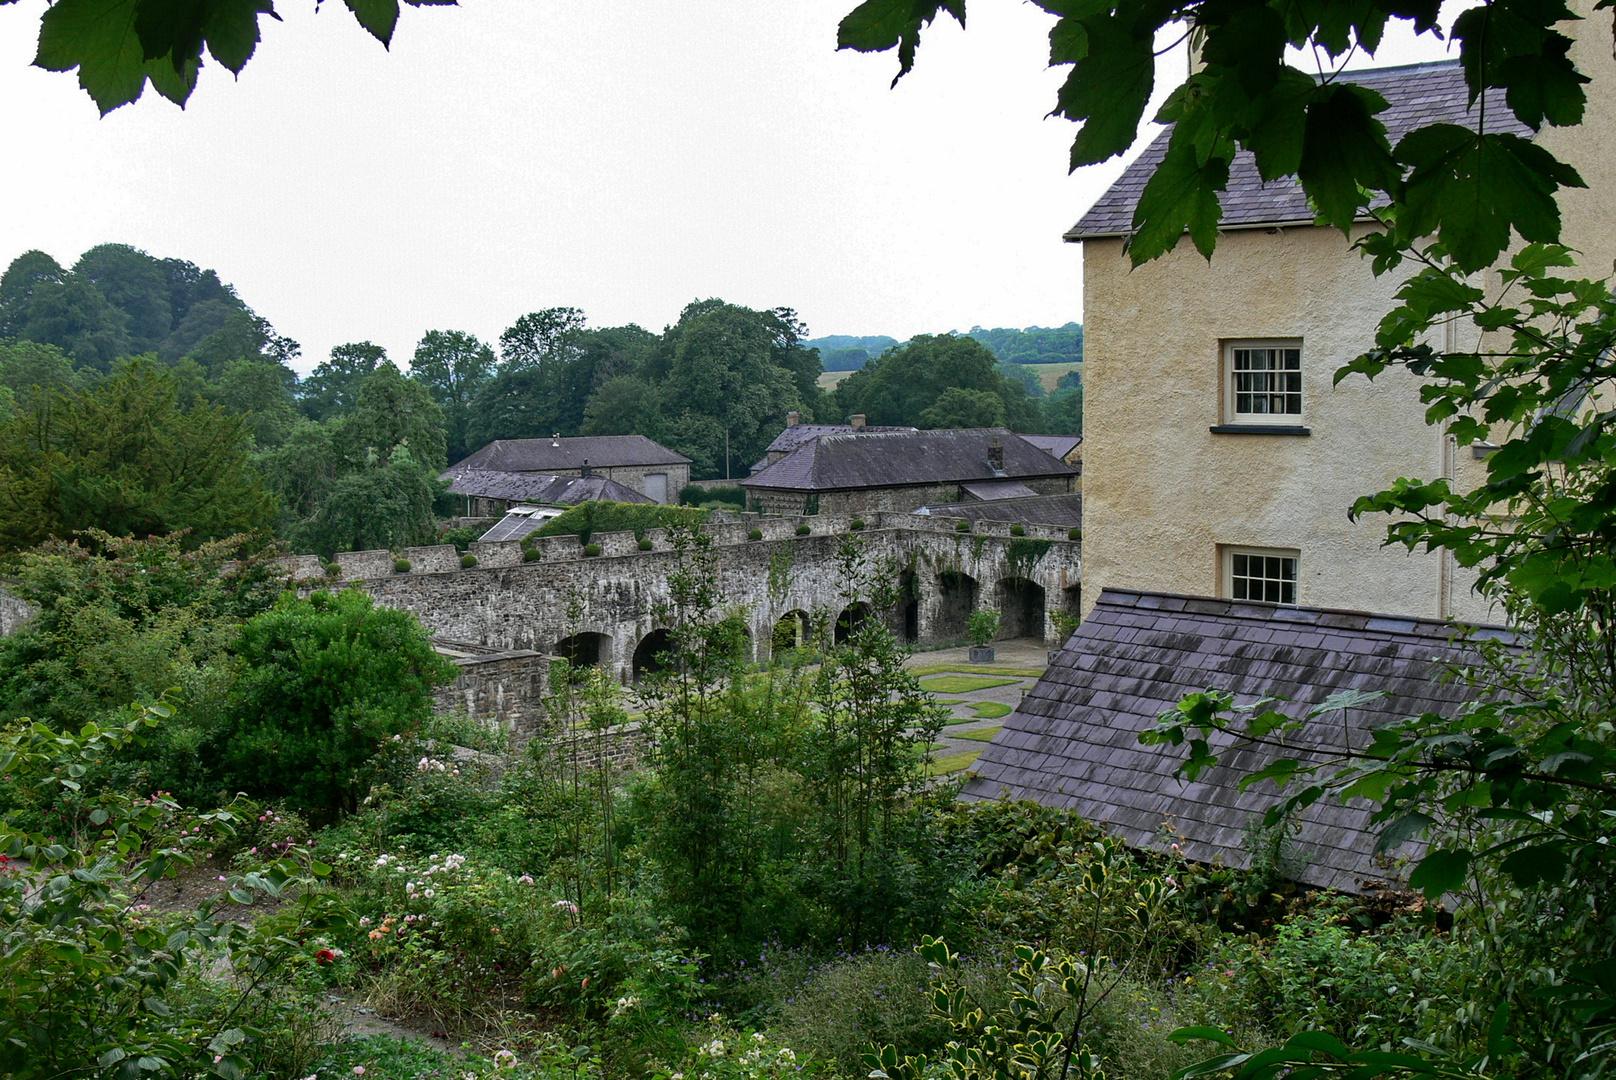 Aberglasney House and Gardens VII